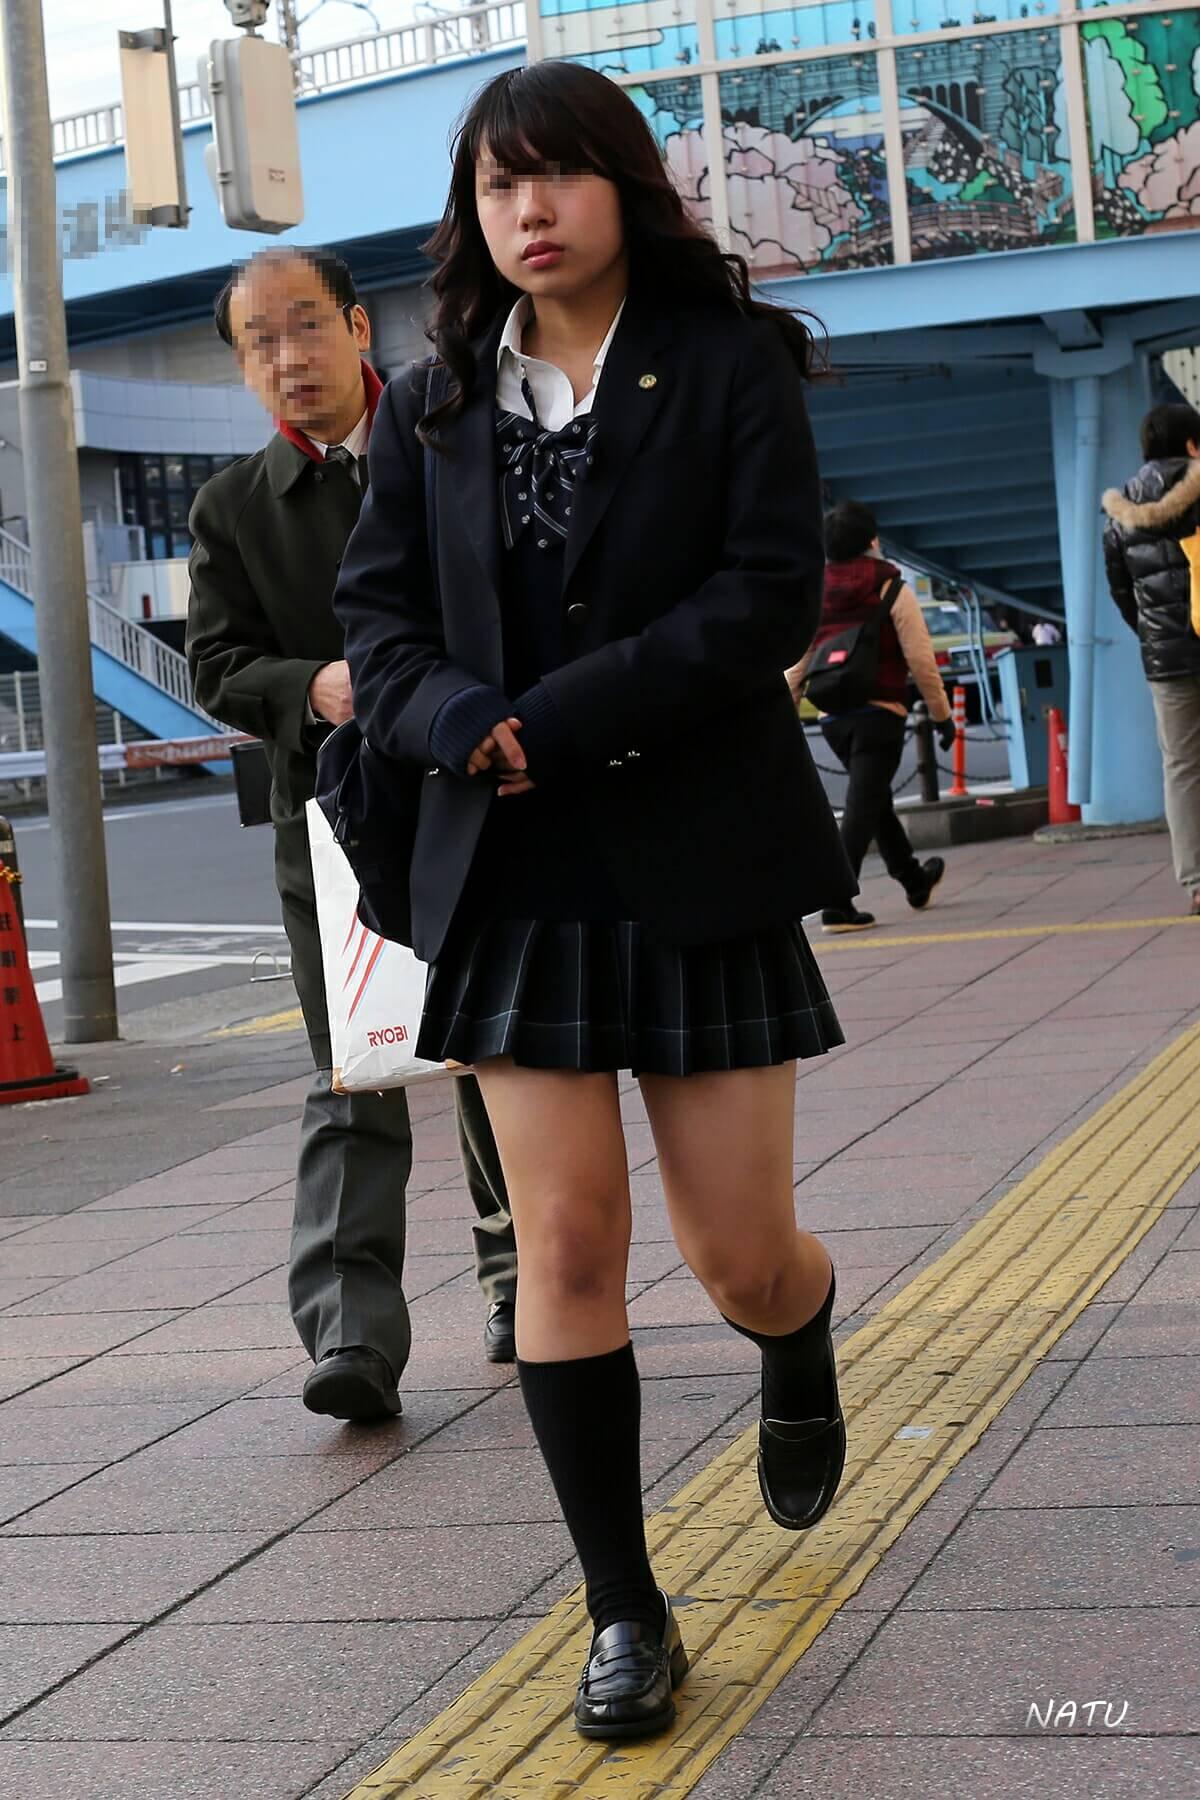 【画像】女子高生の待撮り写真2020春